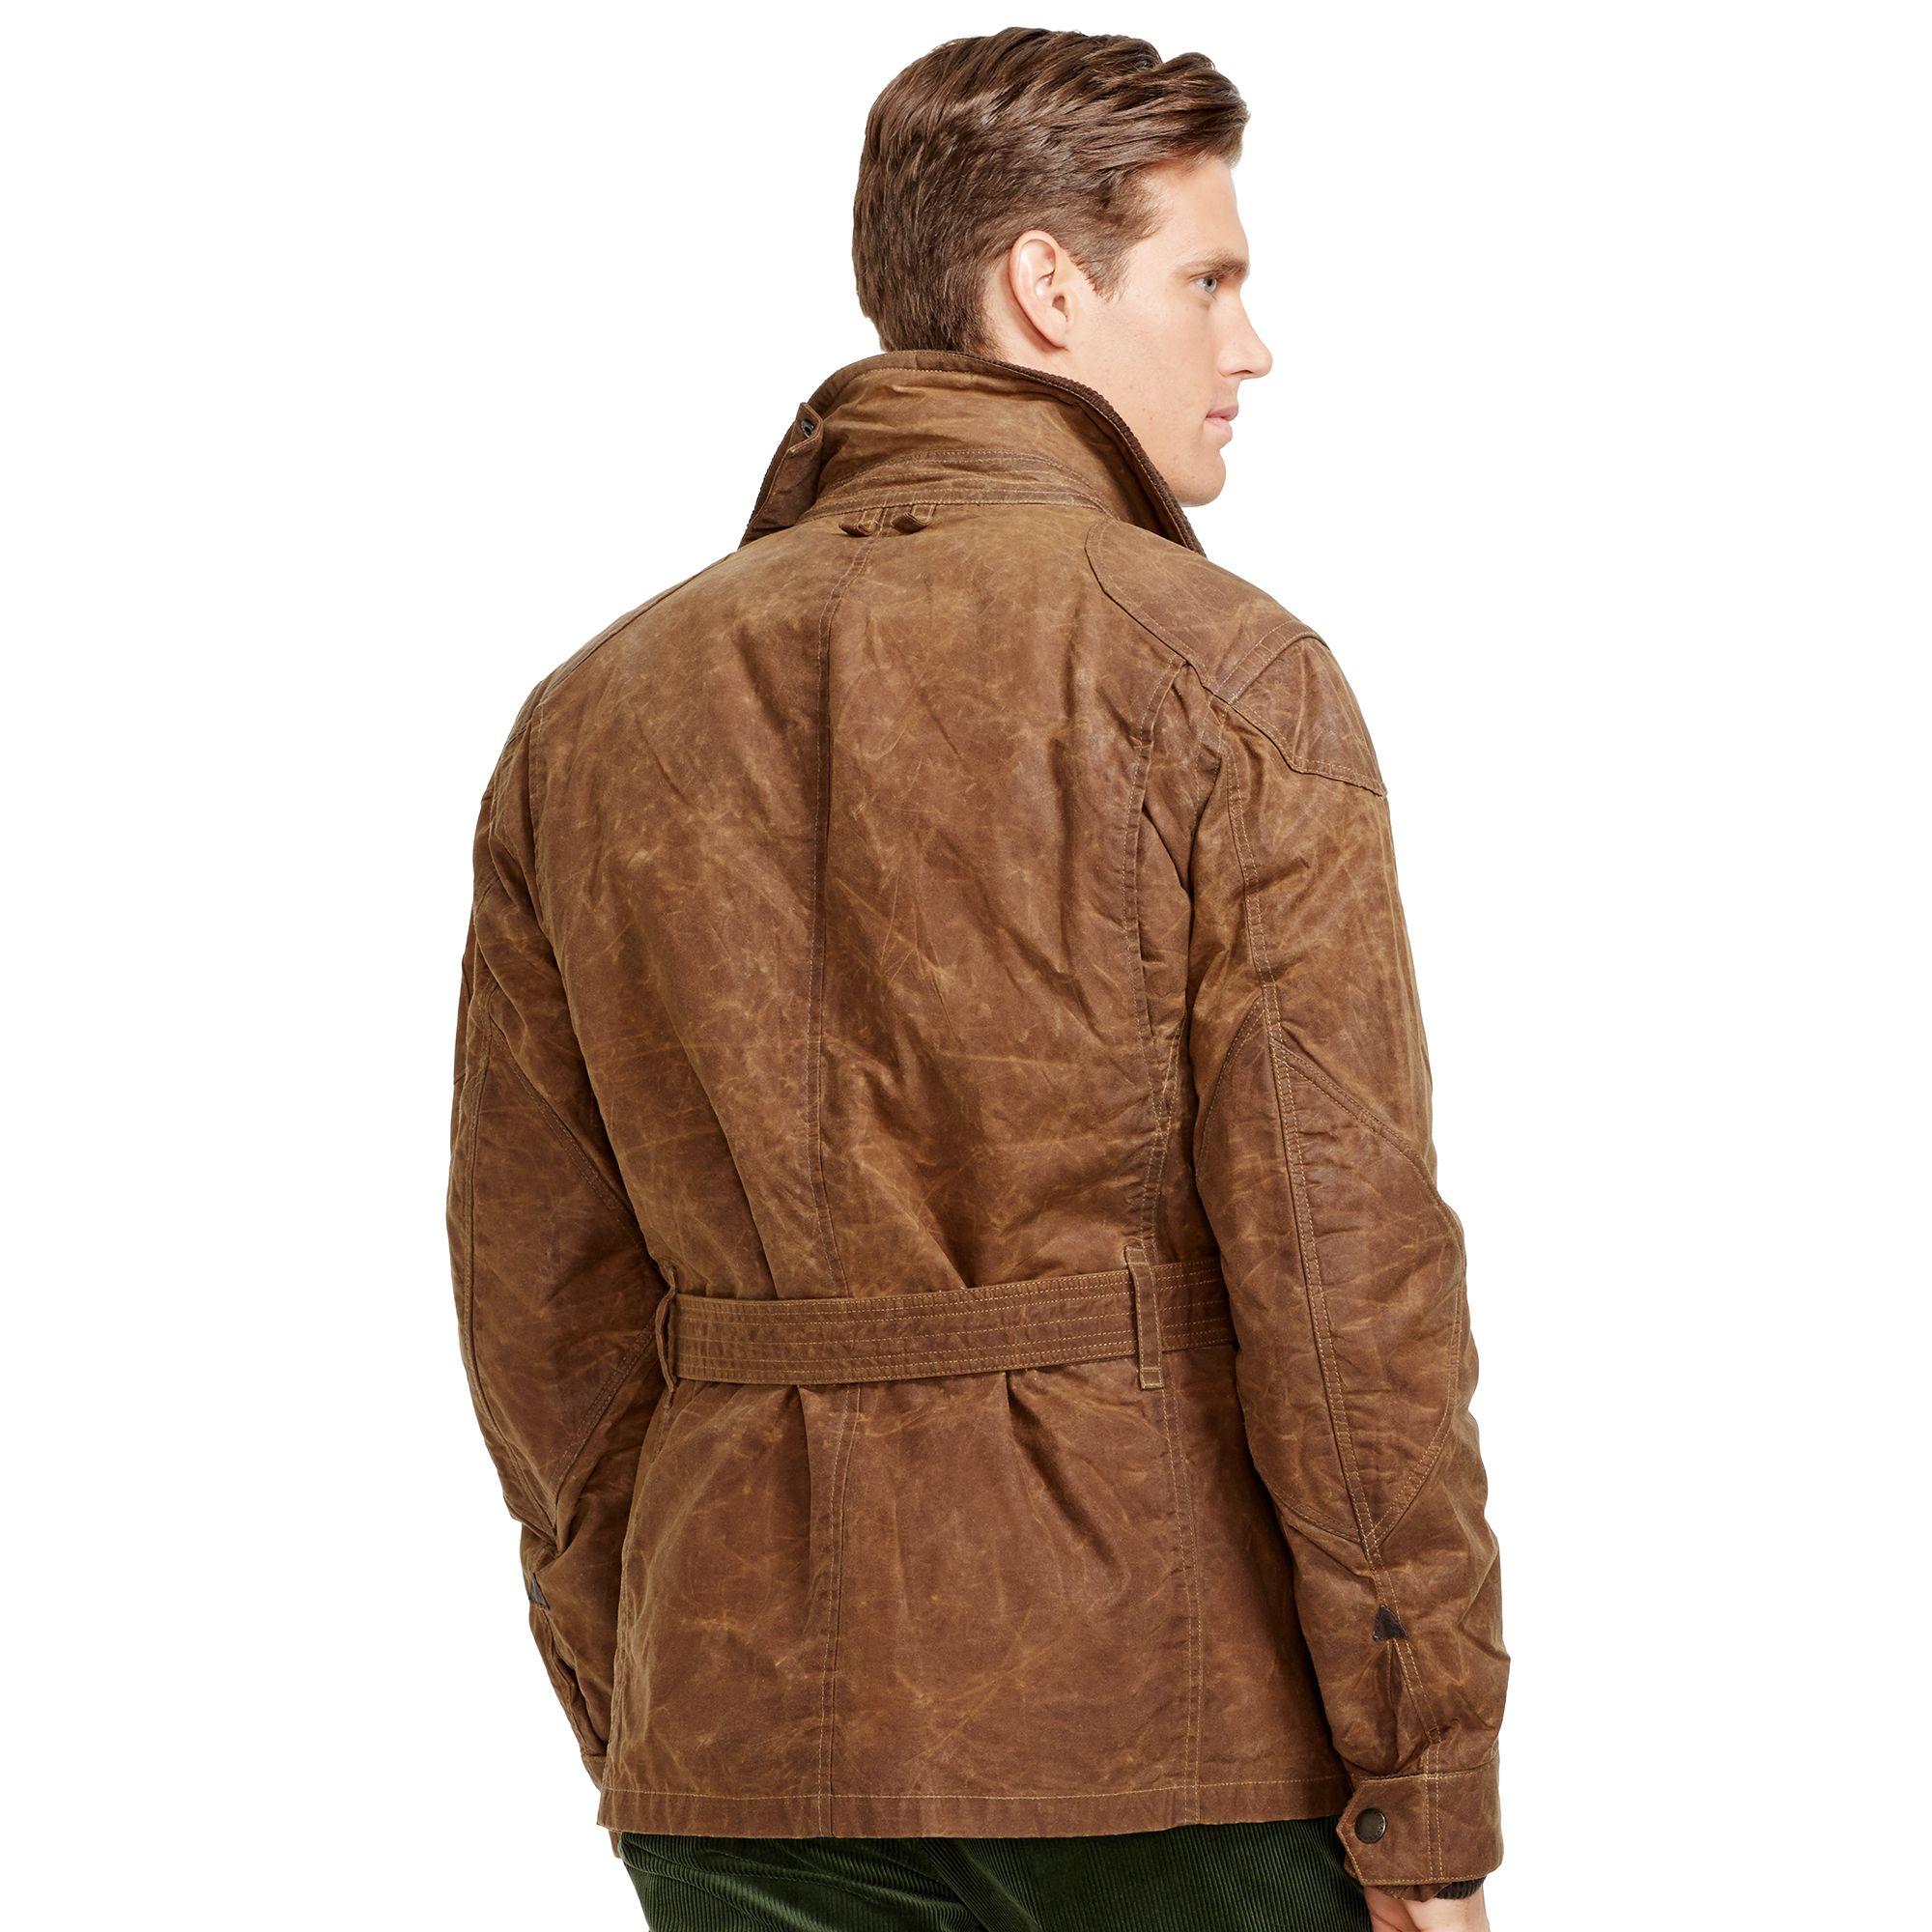 lyst polo ralph lauren belted oilcloth jacket in brown. Black Bedroom Furniture Sets. Home Design Ideas